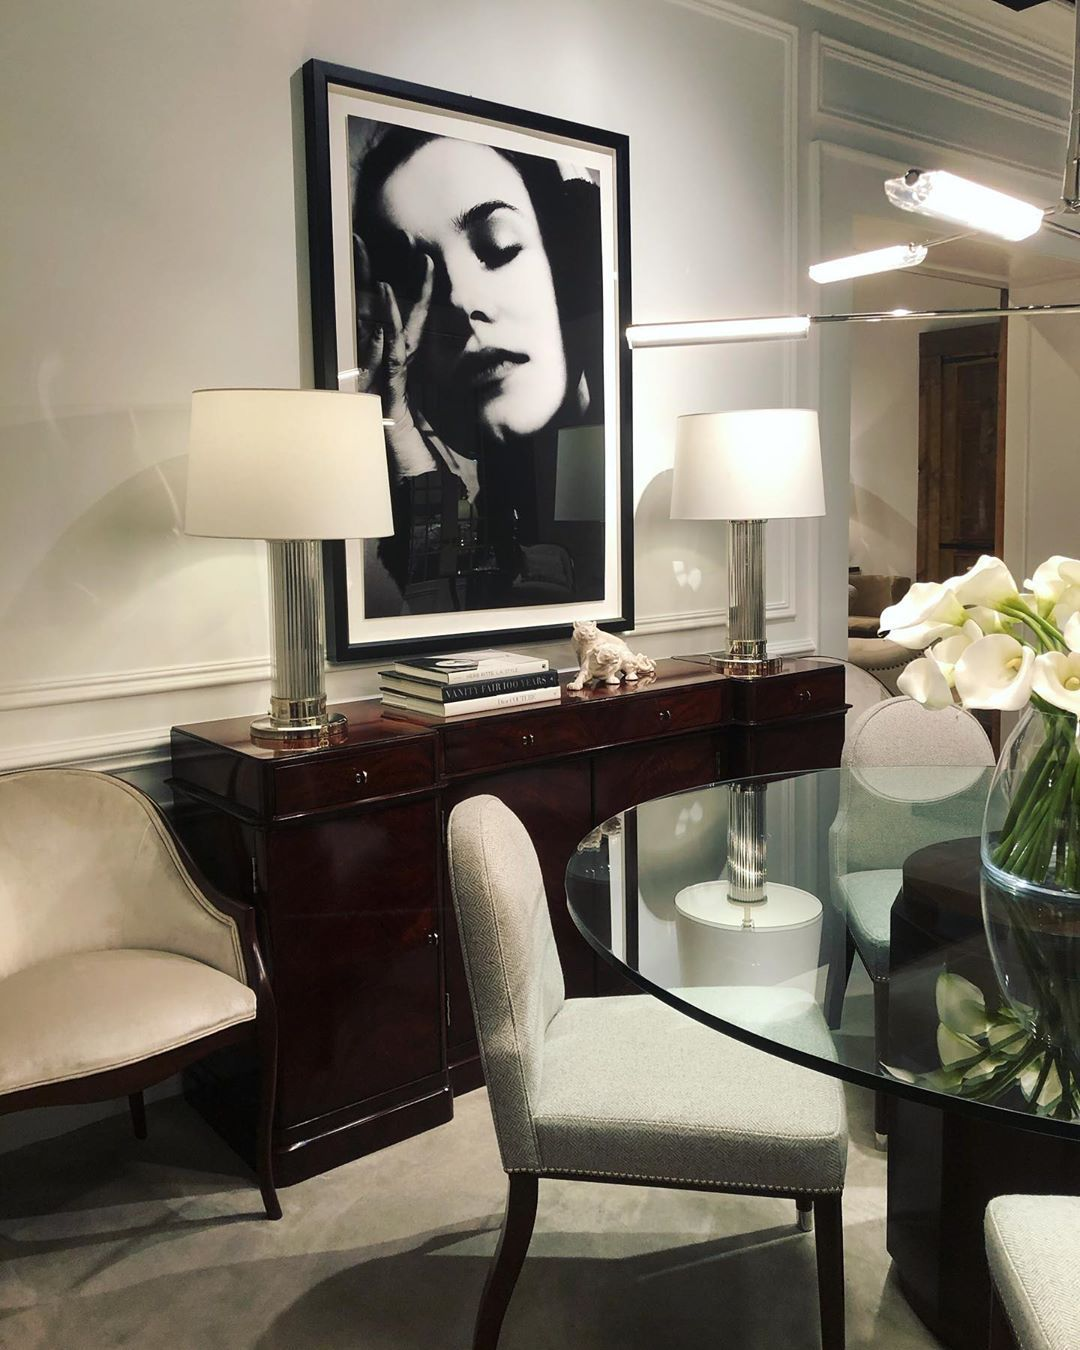 No One Does Modern Art Deco Like Ralph Lauren Chic Ralphlauren Art Artdeco Chic Design Designer Details Luxe Luxury Furniture Style F Dekor